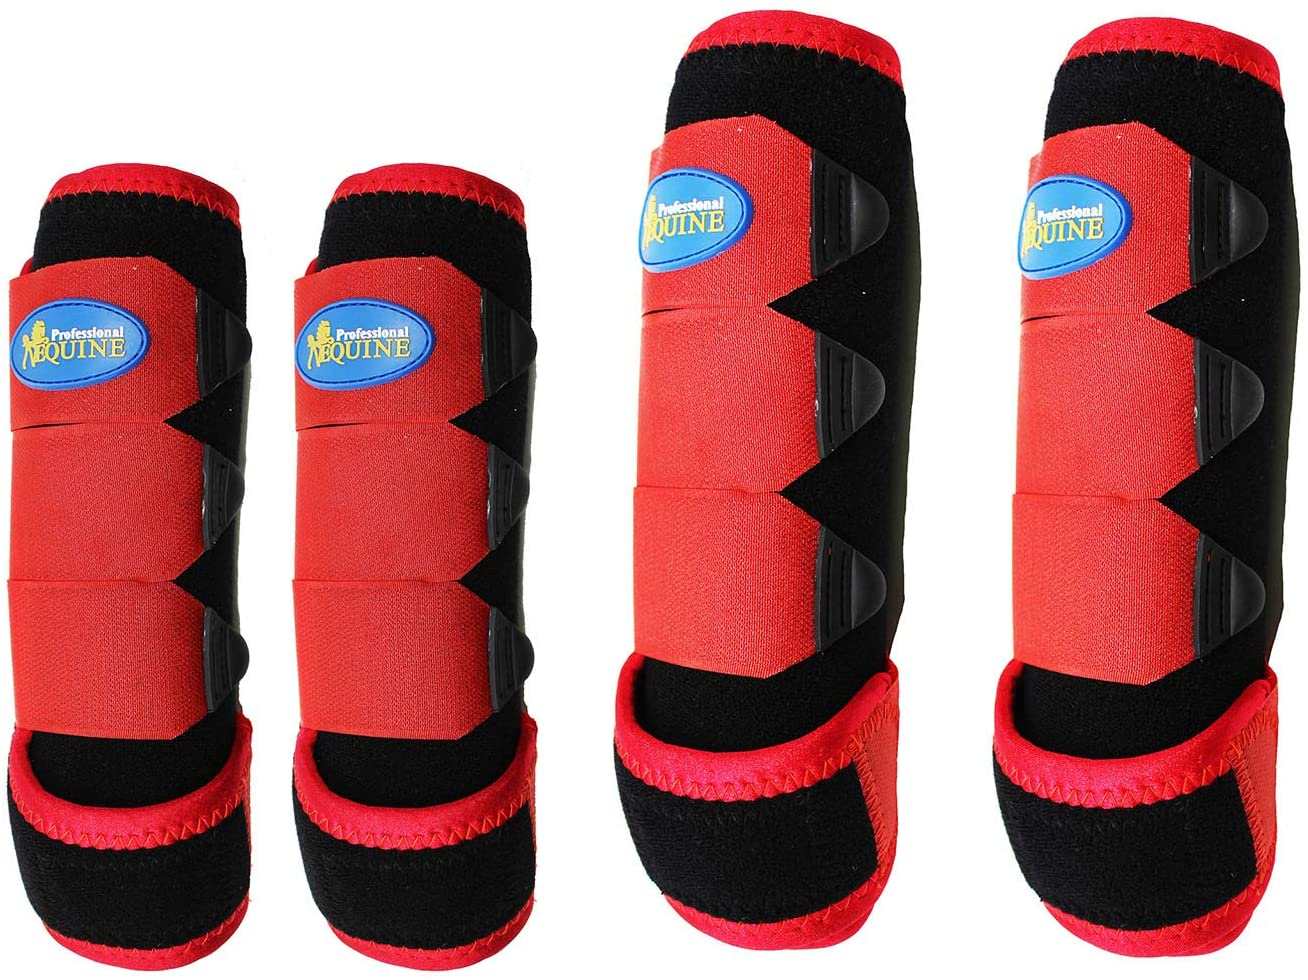 Professional Equine Horse Medium Sports Medicine Splint Boots Black Red 4110C